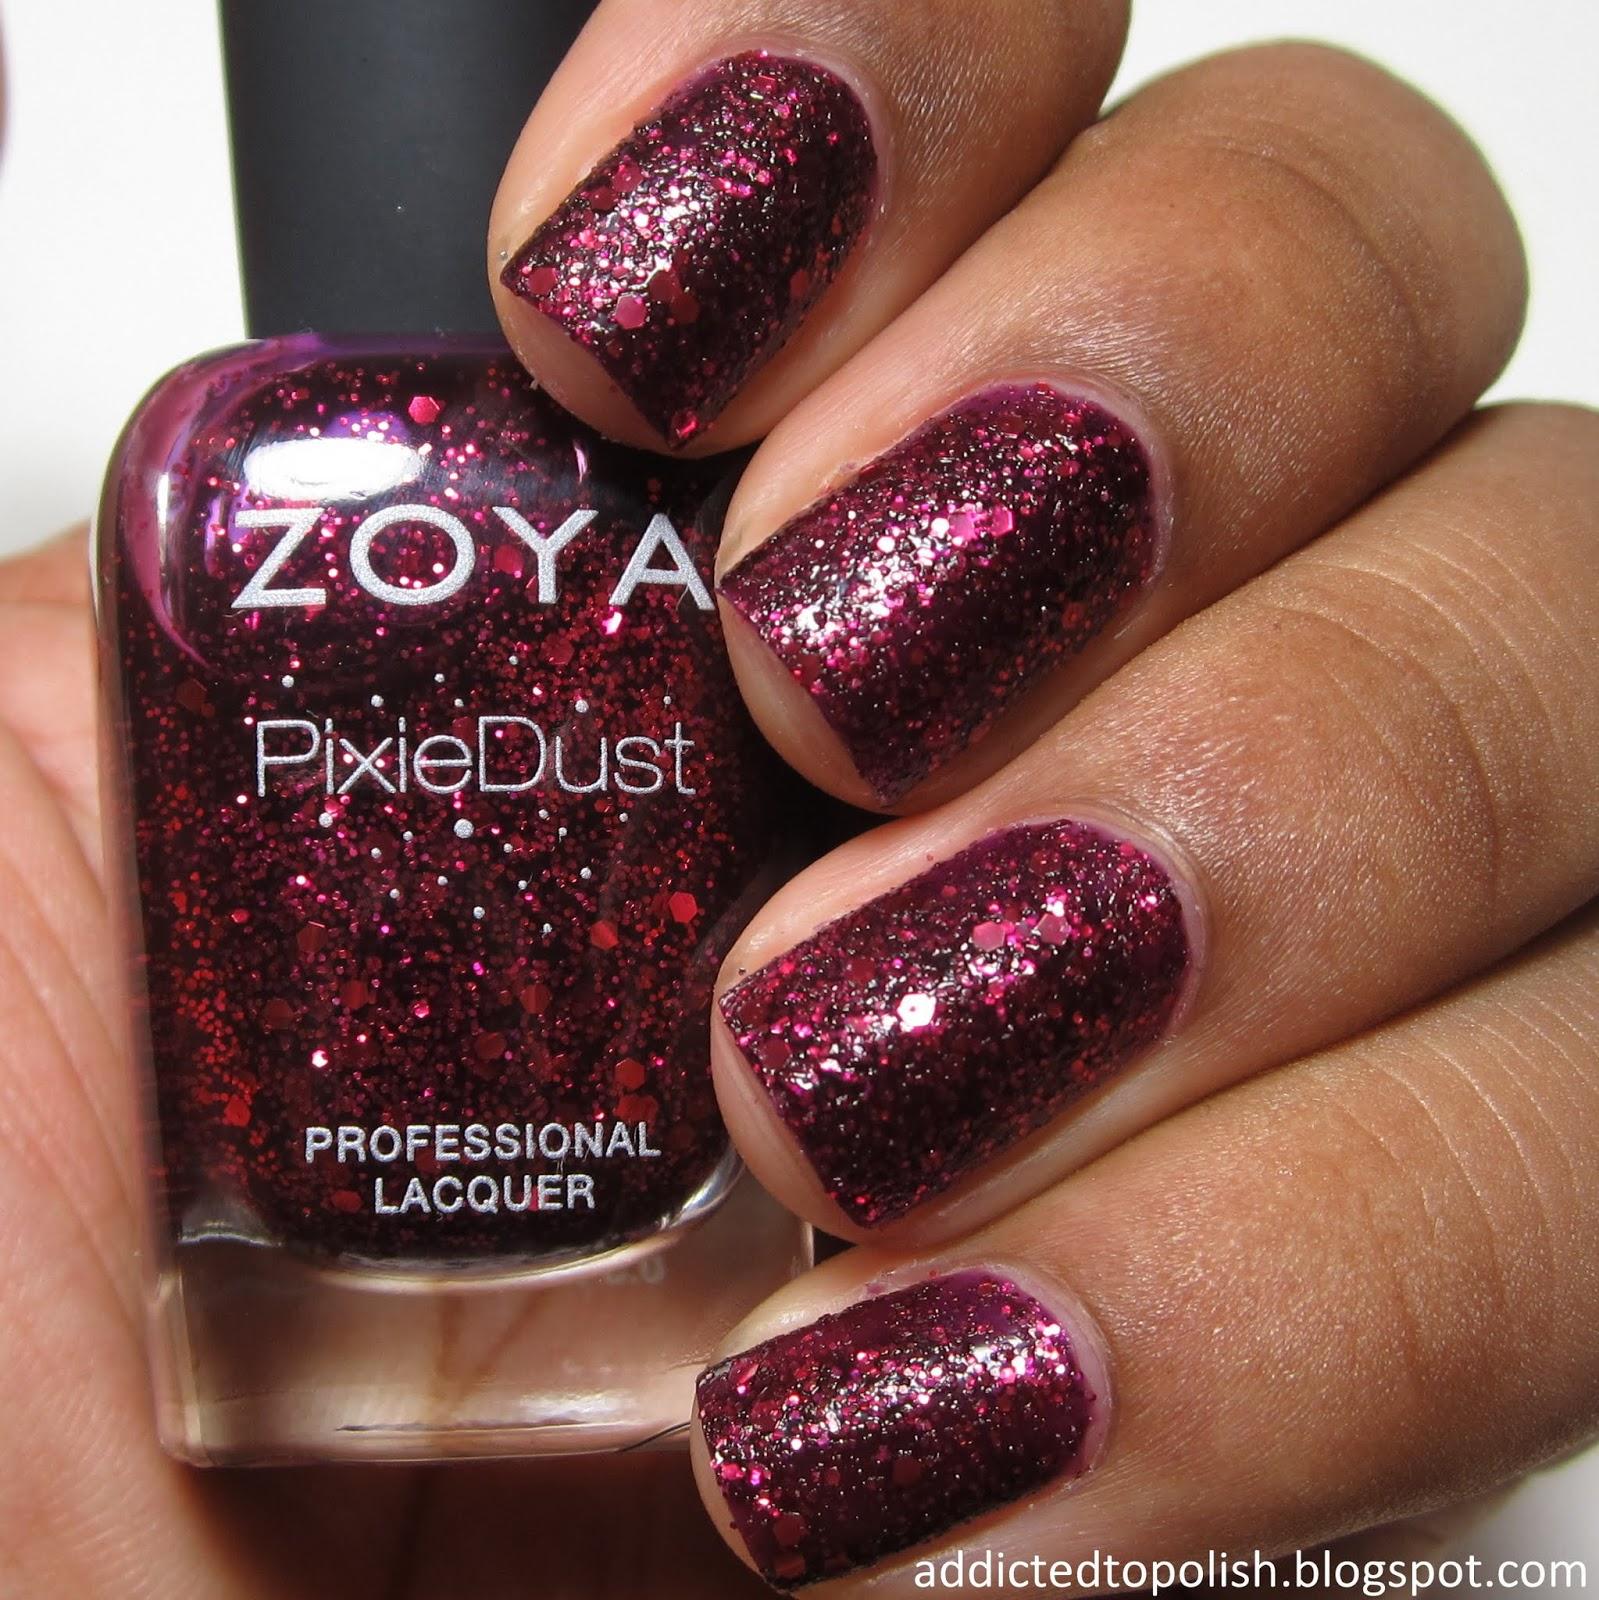 zoya-ultra-pixiedust-noir